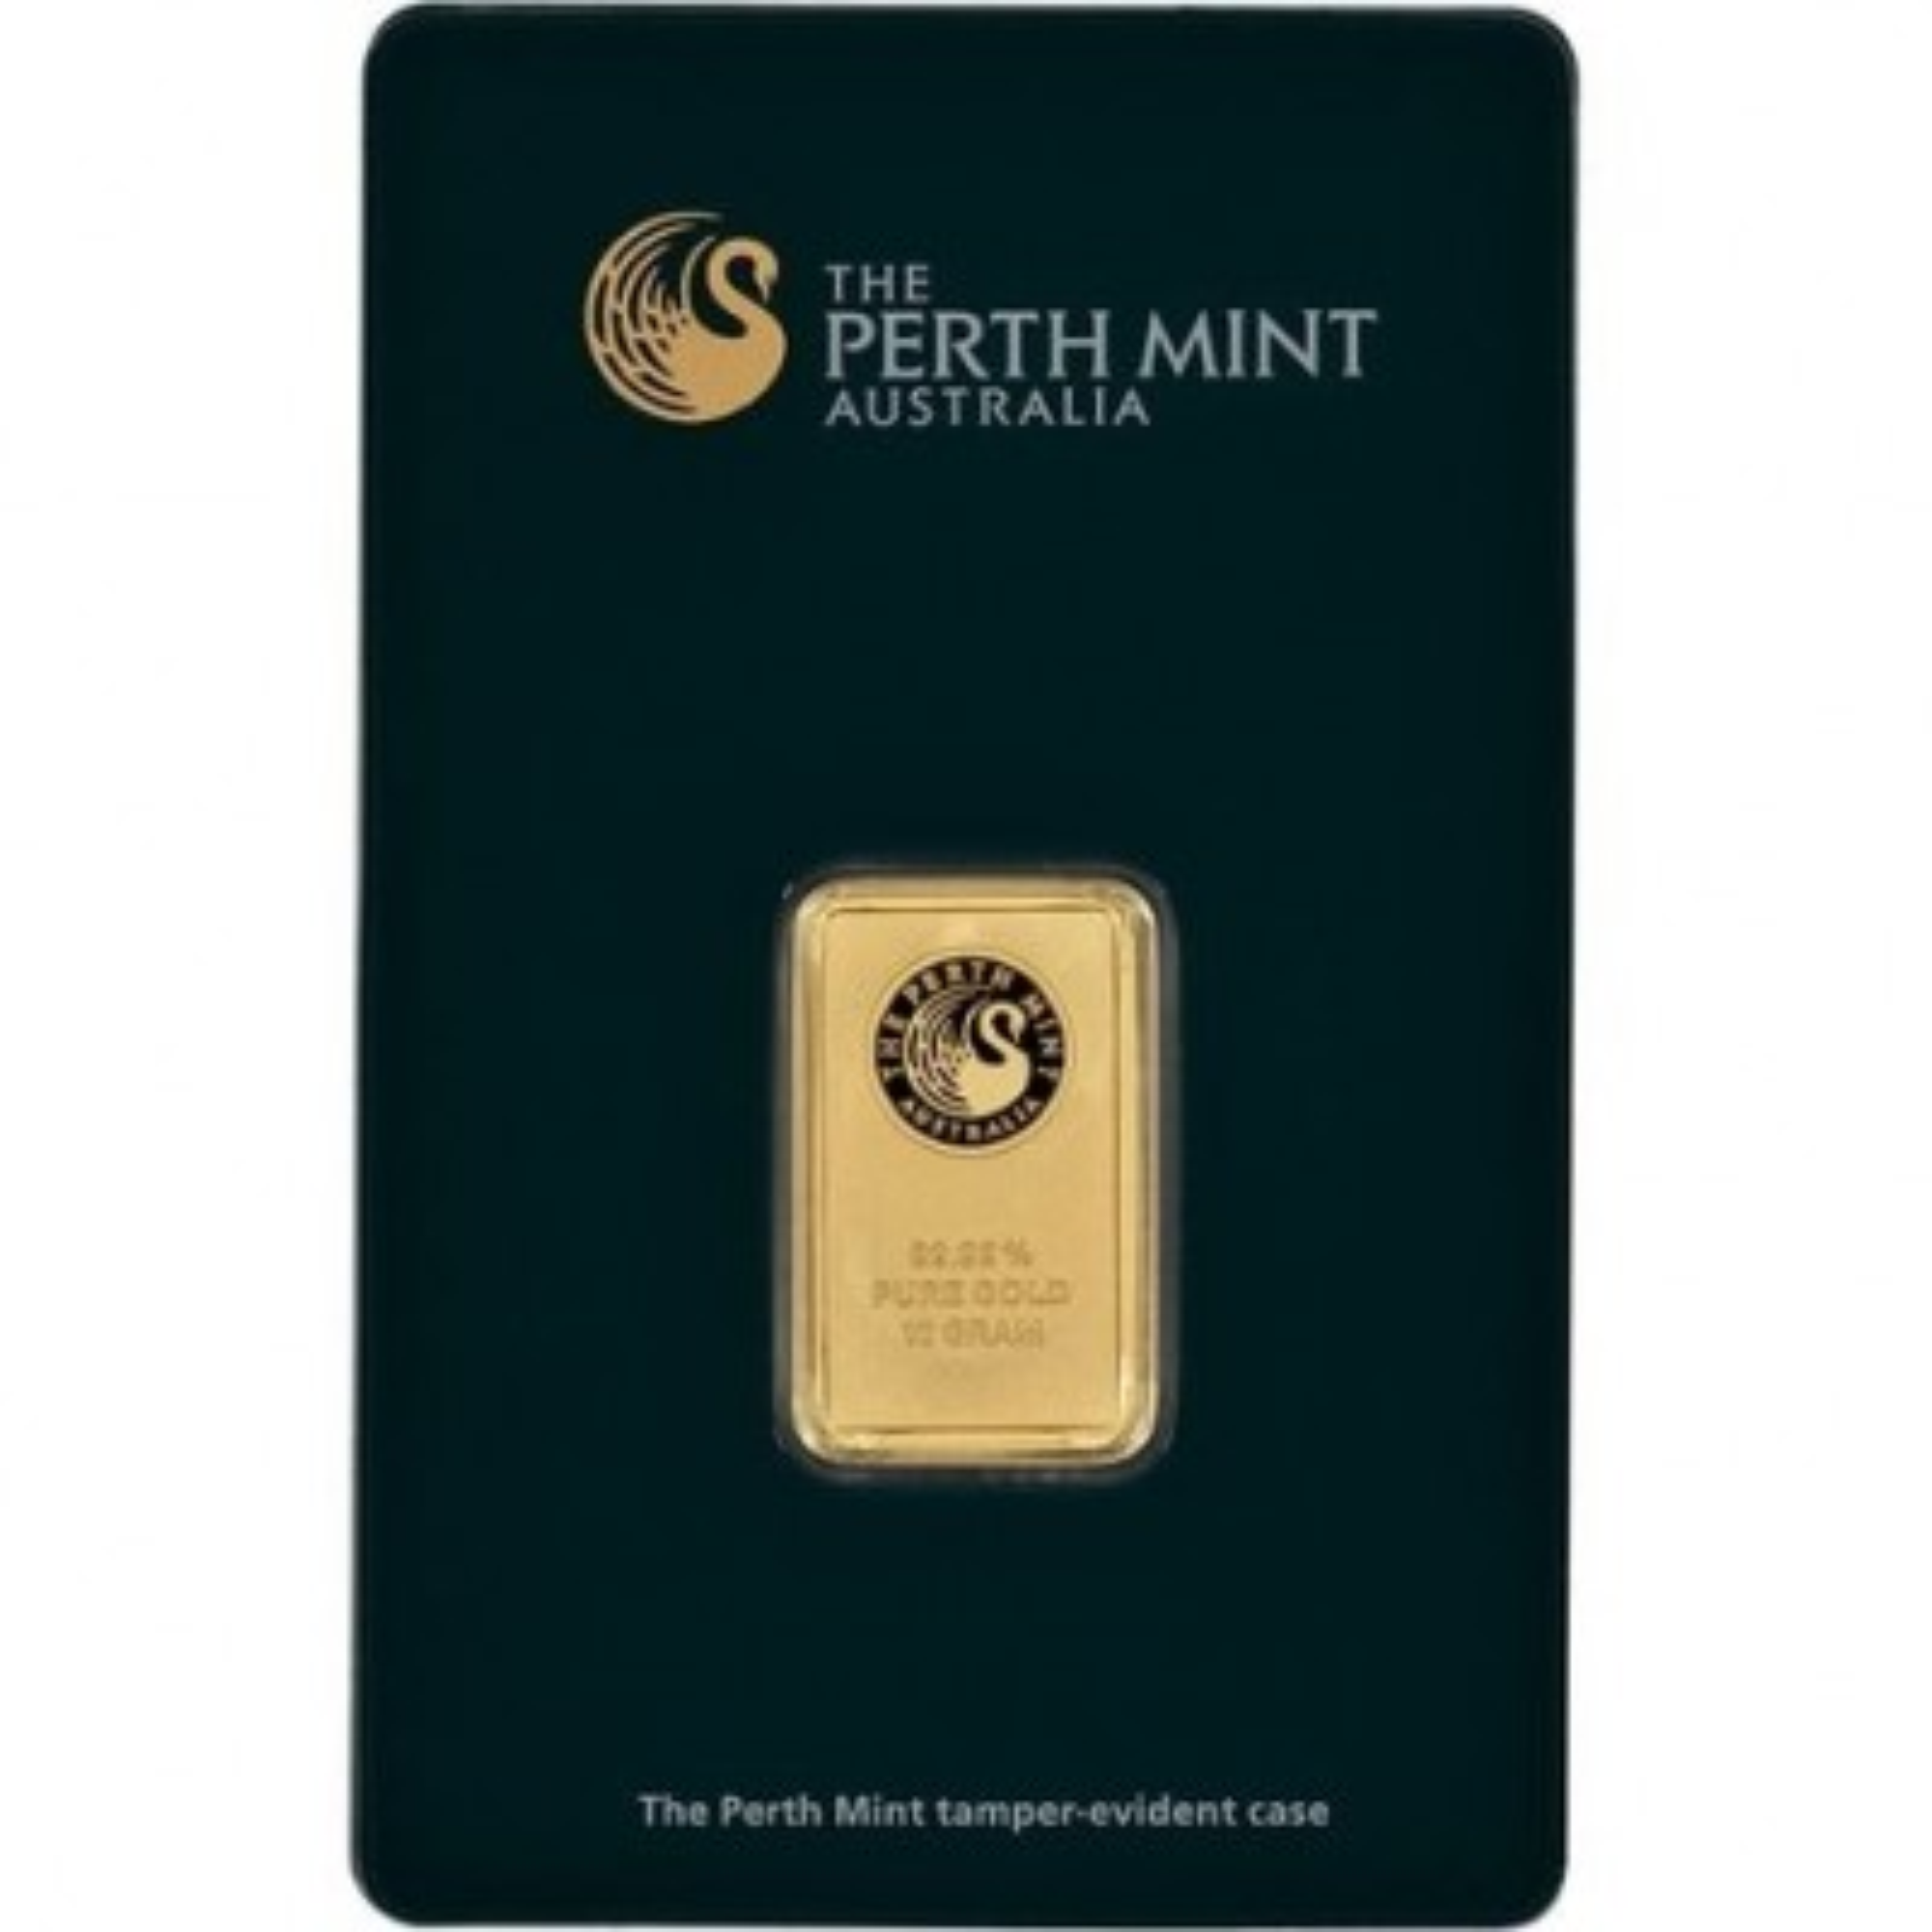 10 Gram goud baar Perth Mint seal